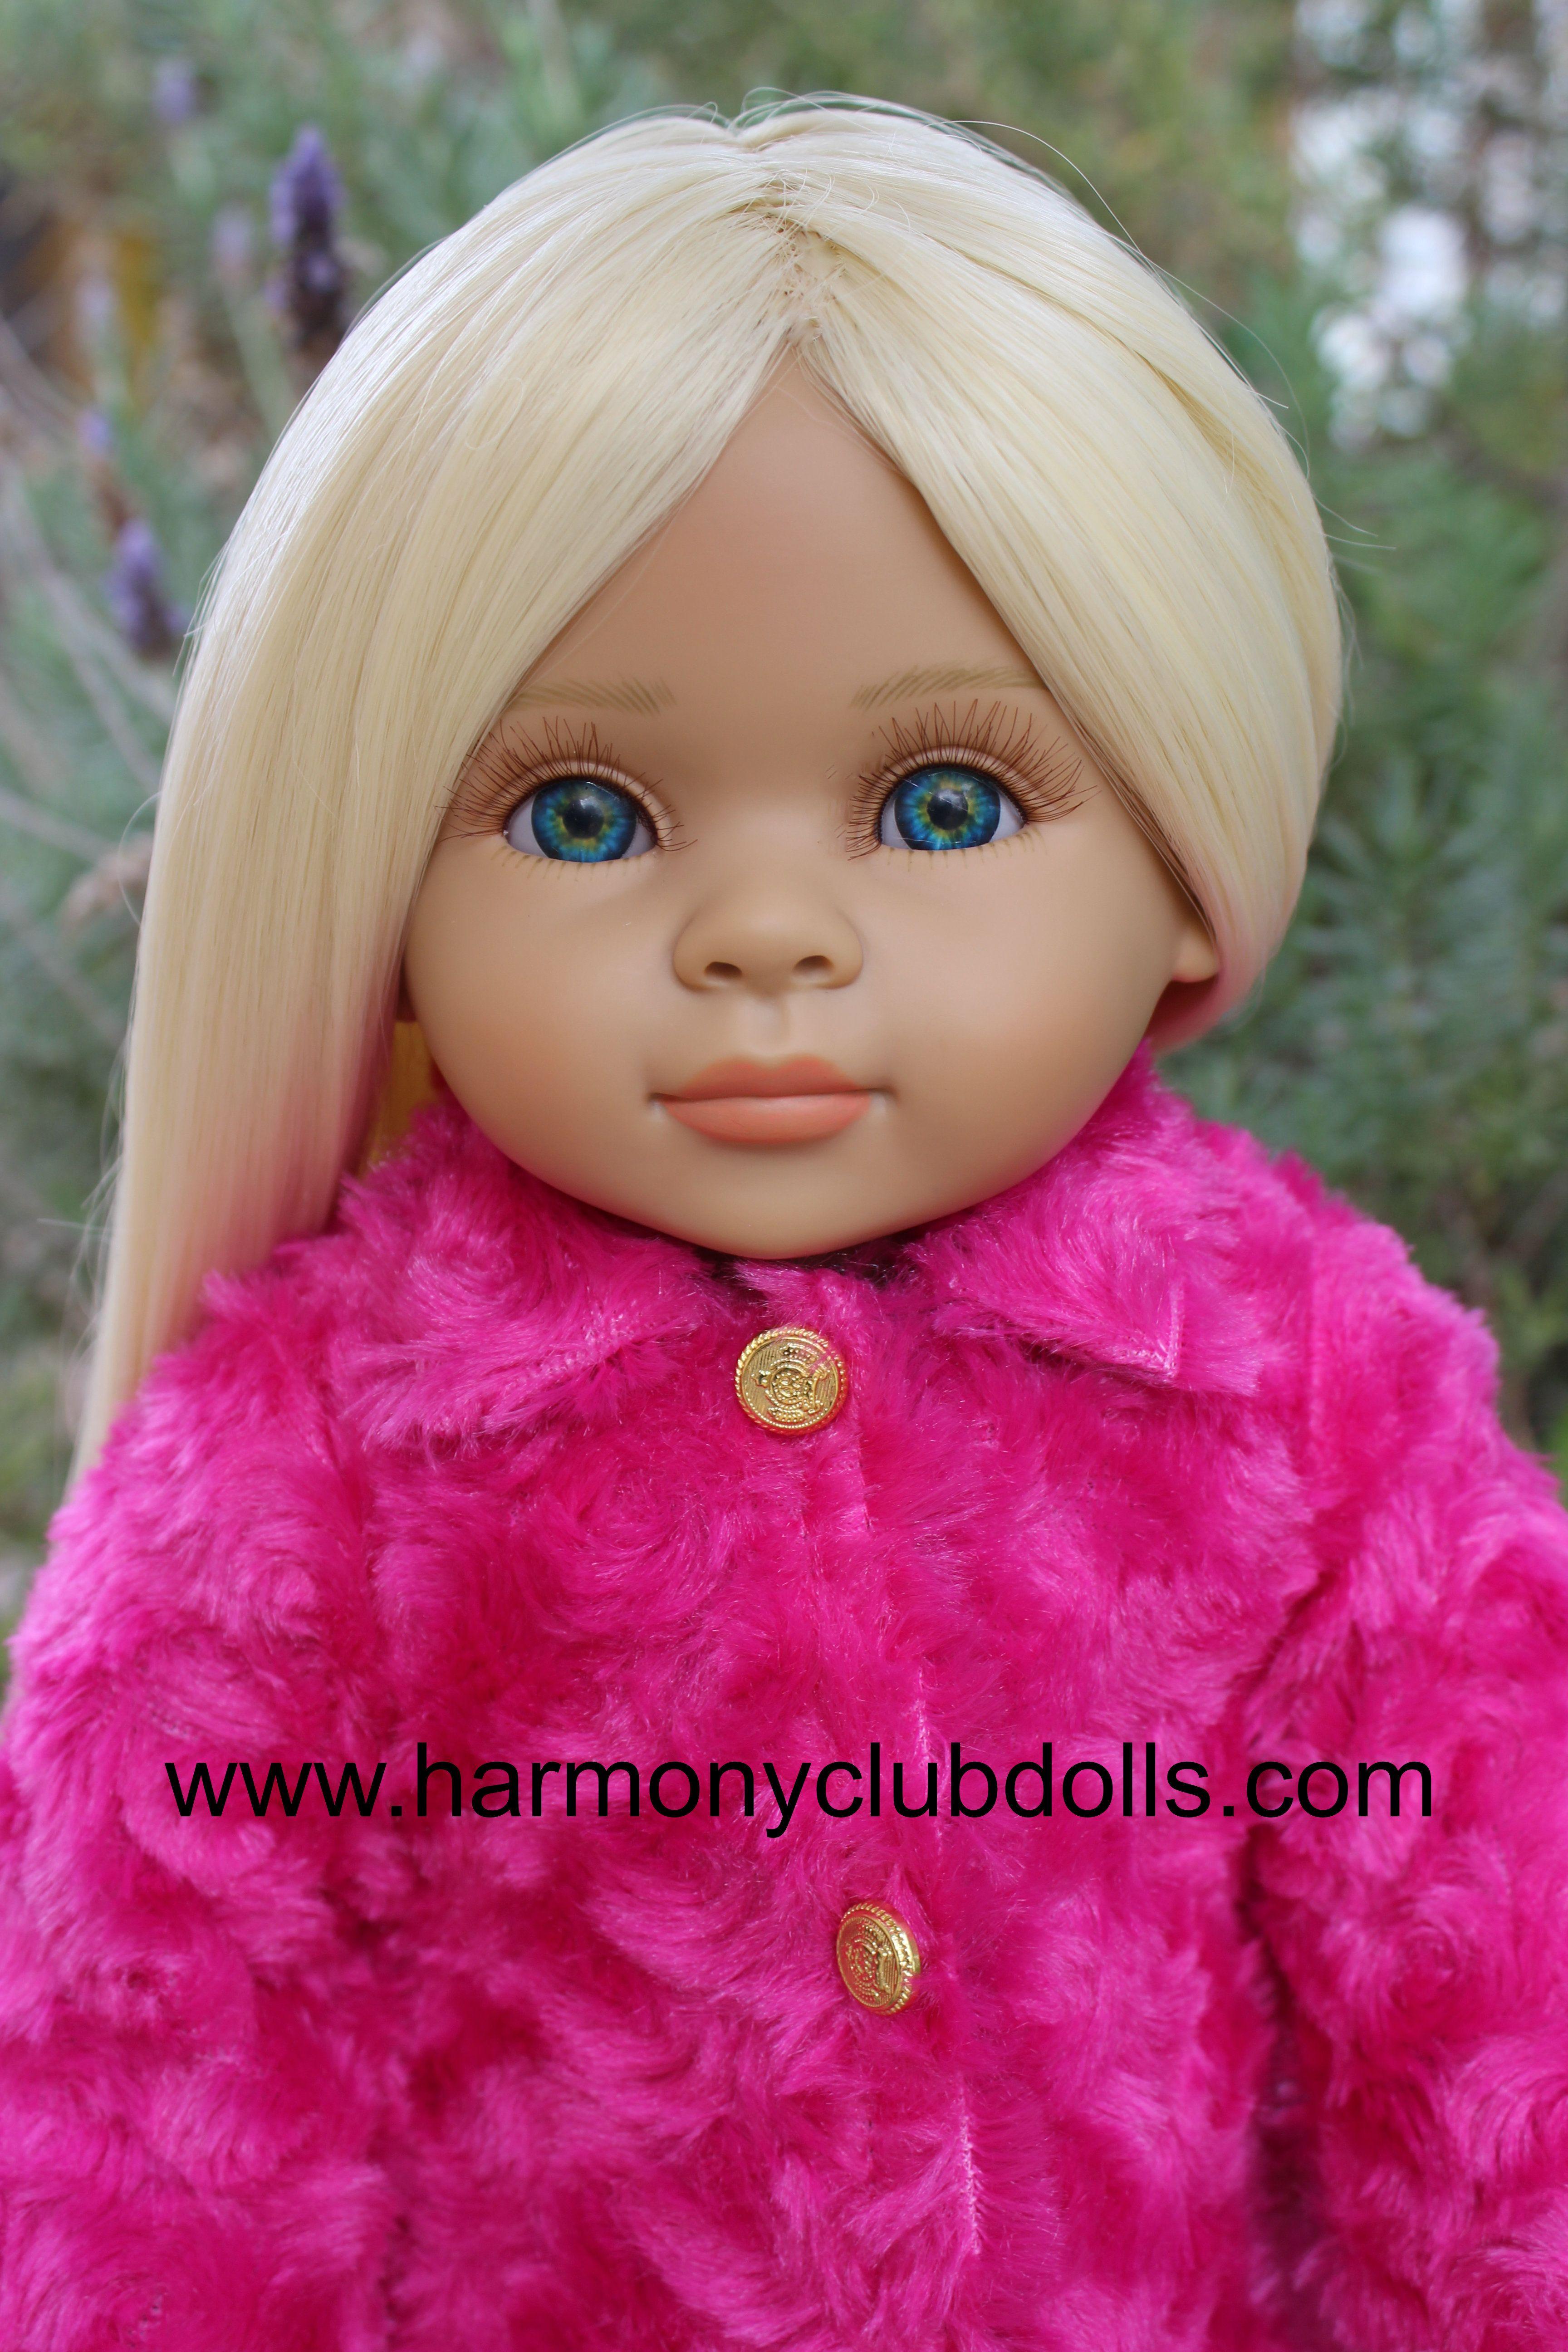 HARMONY CLUB DOLLS. Visit over 300 styles to fit American Girl dolls www.harmonyclubdolls.com